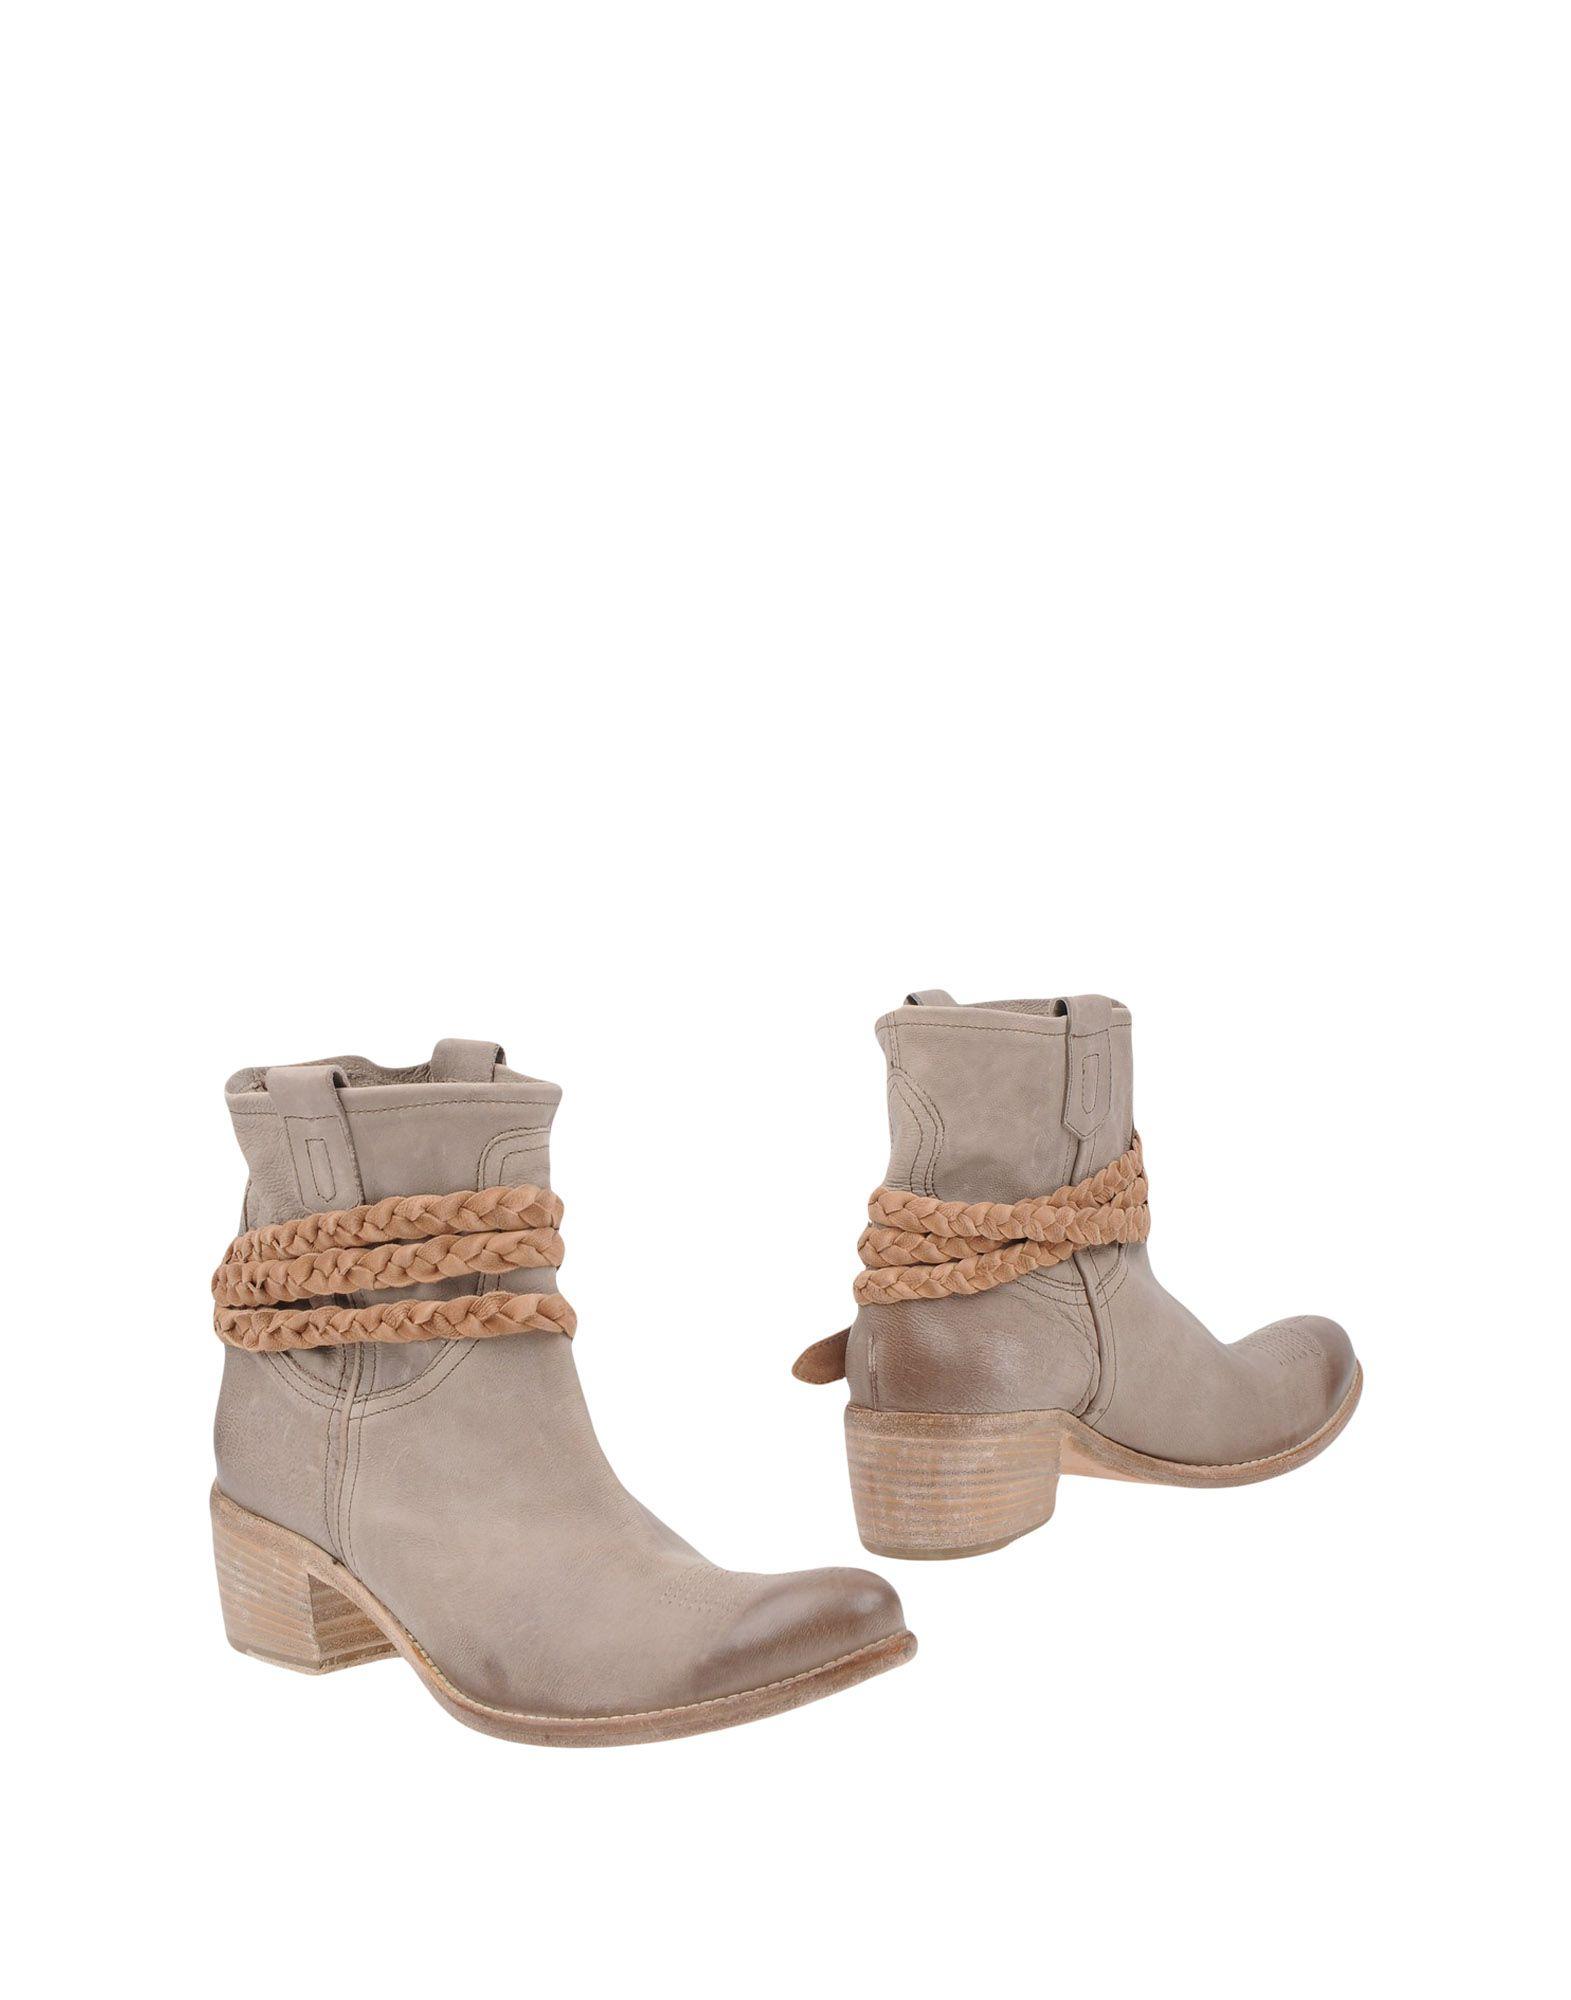 GARRICE Полусапоги и высокие ботинки garrice полусапоги и высокие ботинки